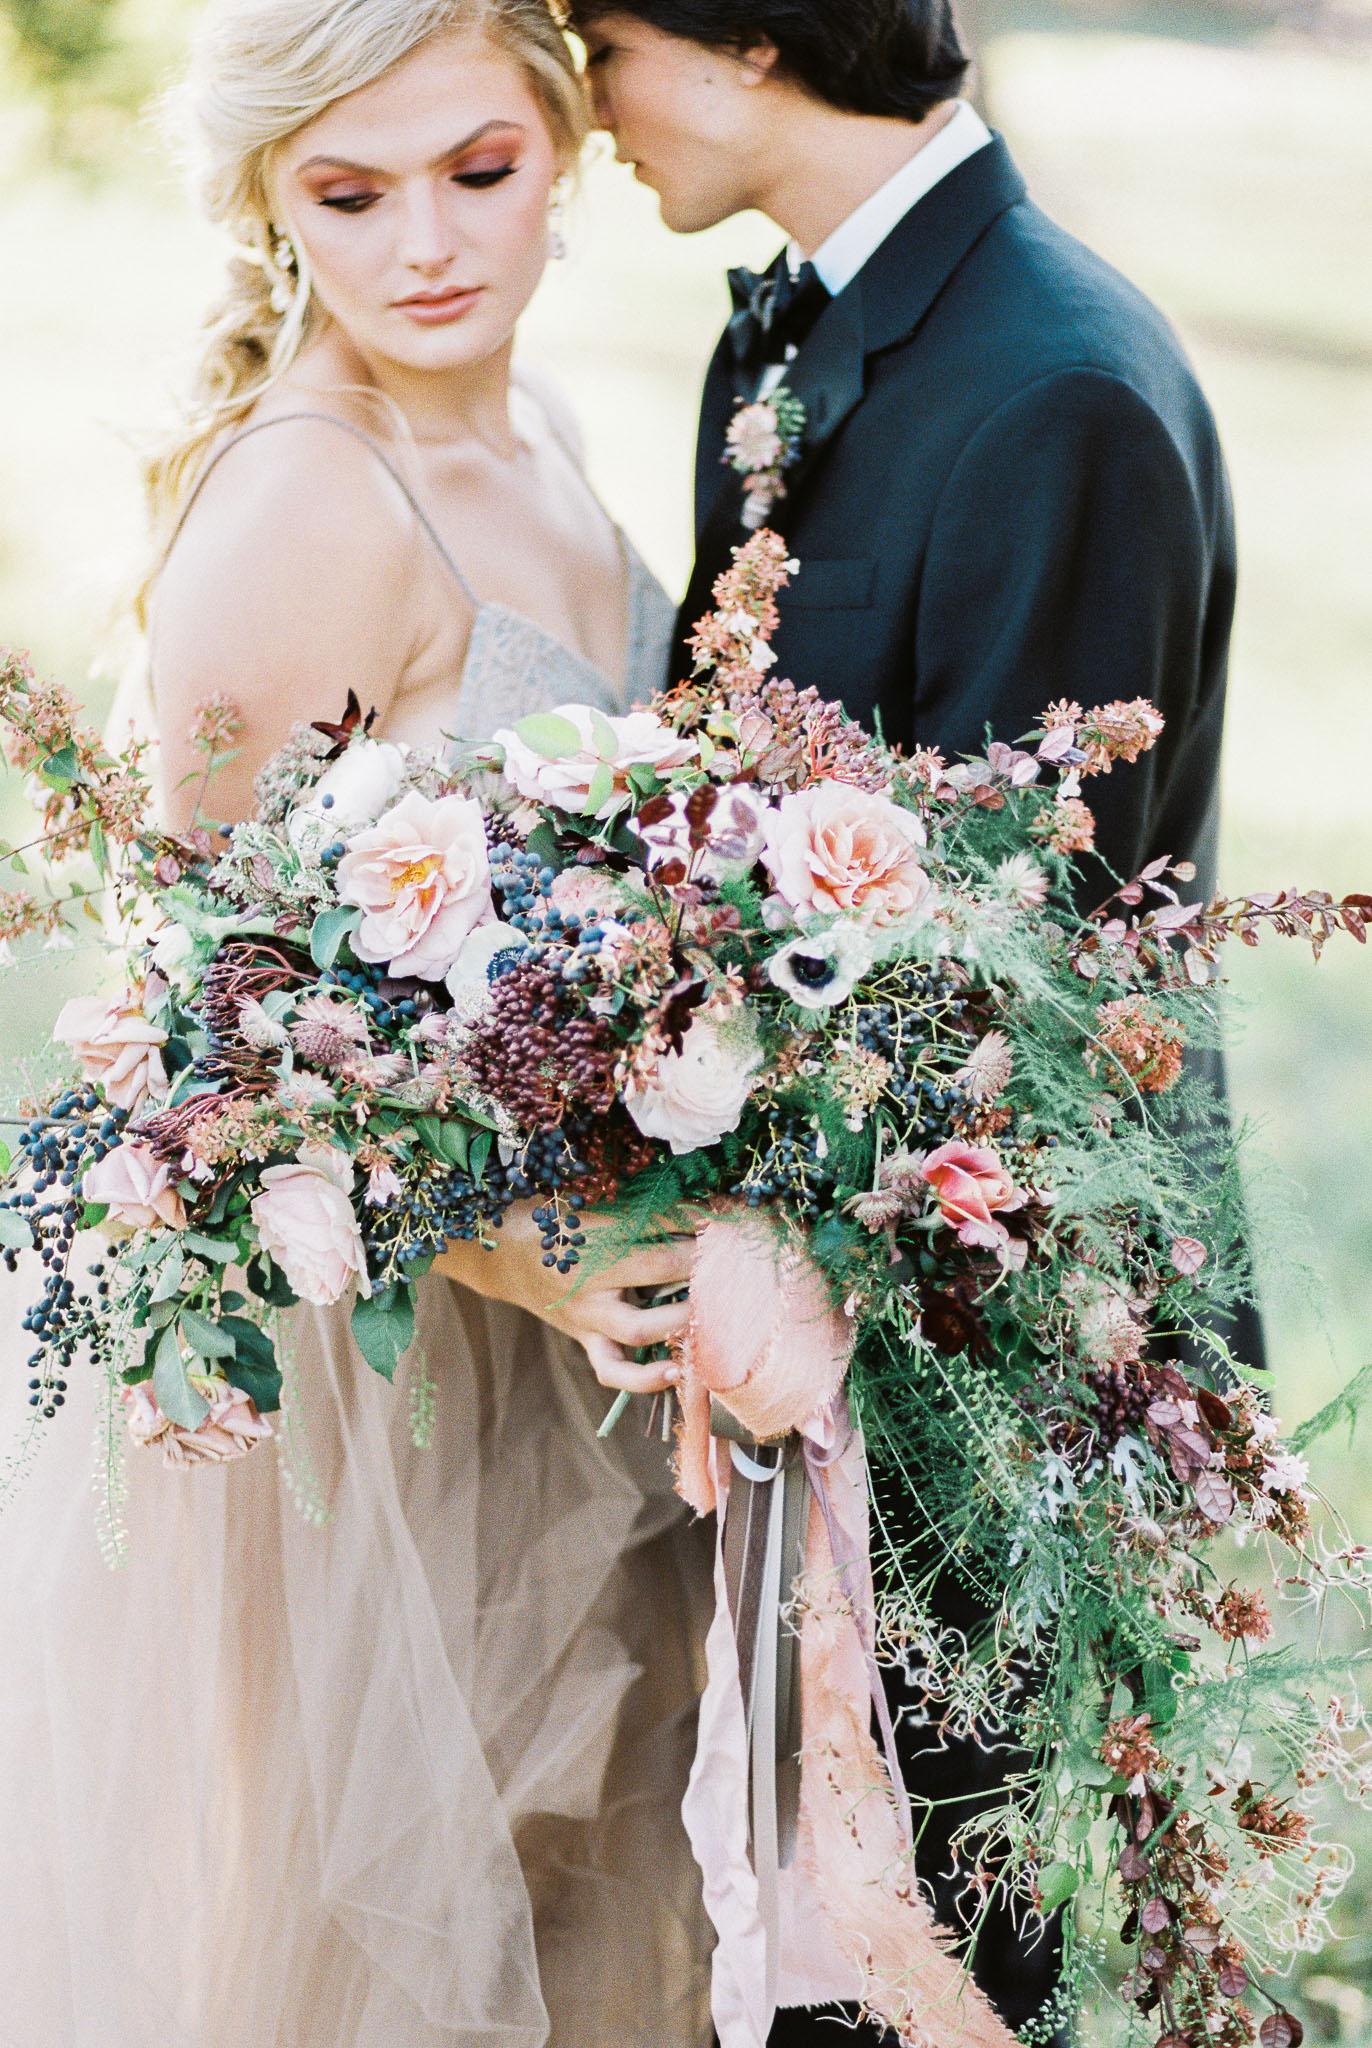 holly-chapple-large-bridal-wedding-bouquet